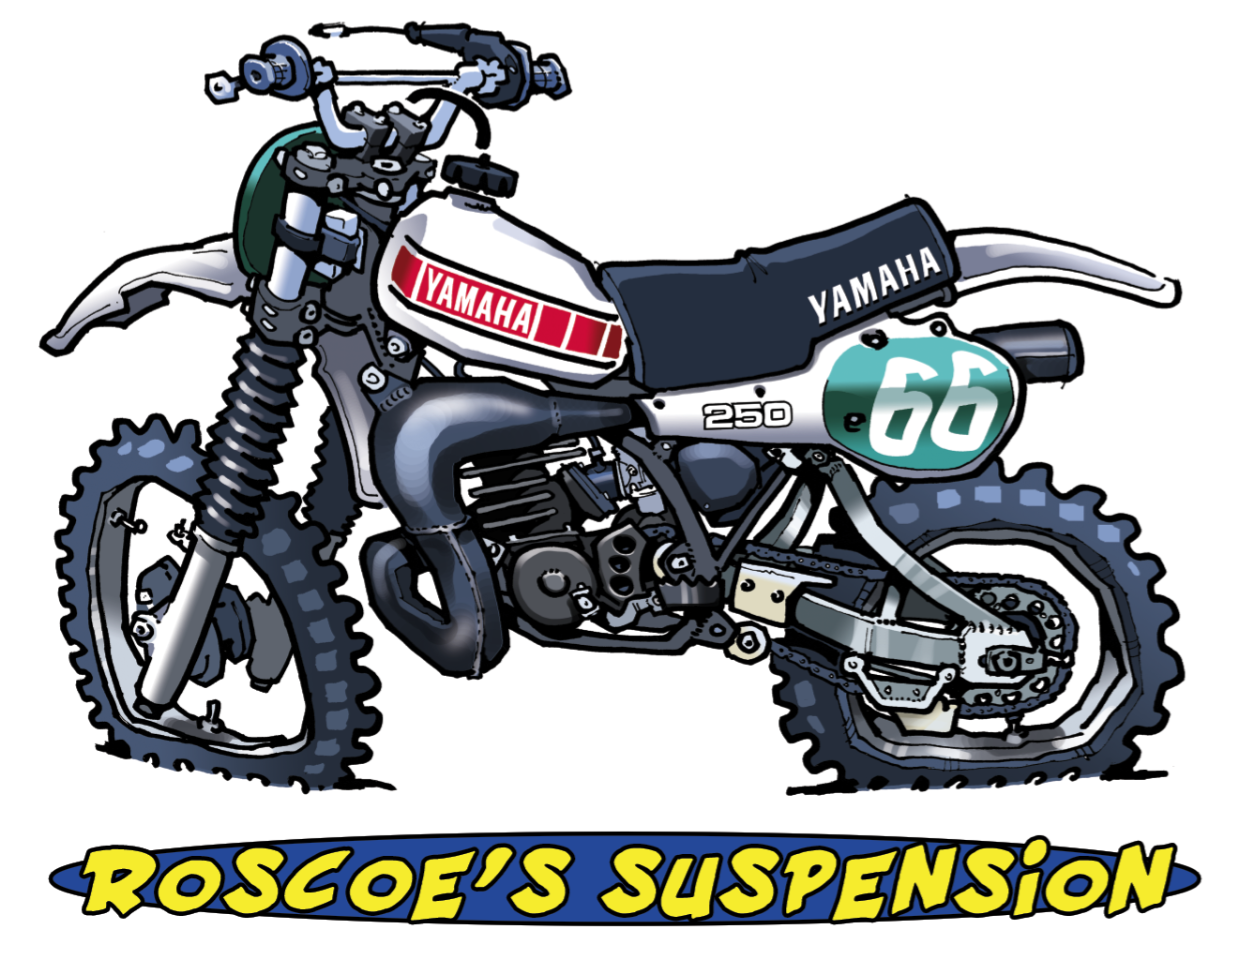 Roscoe s Suspension